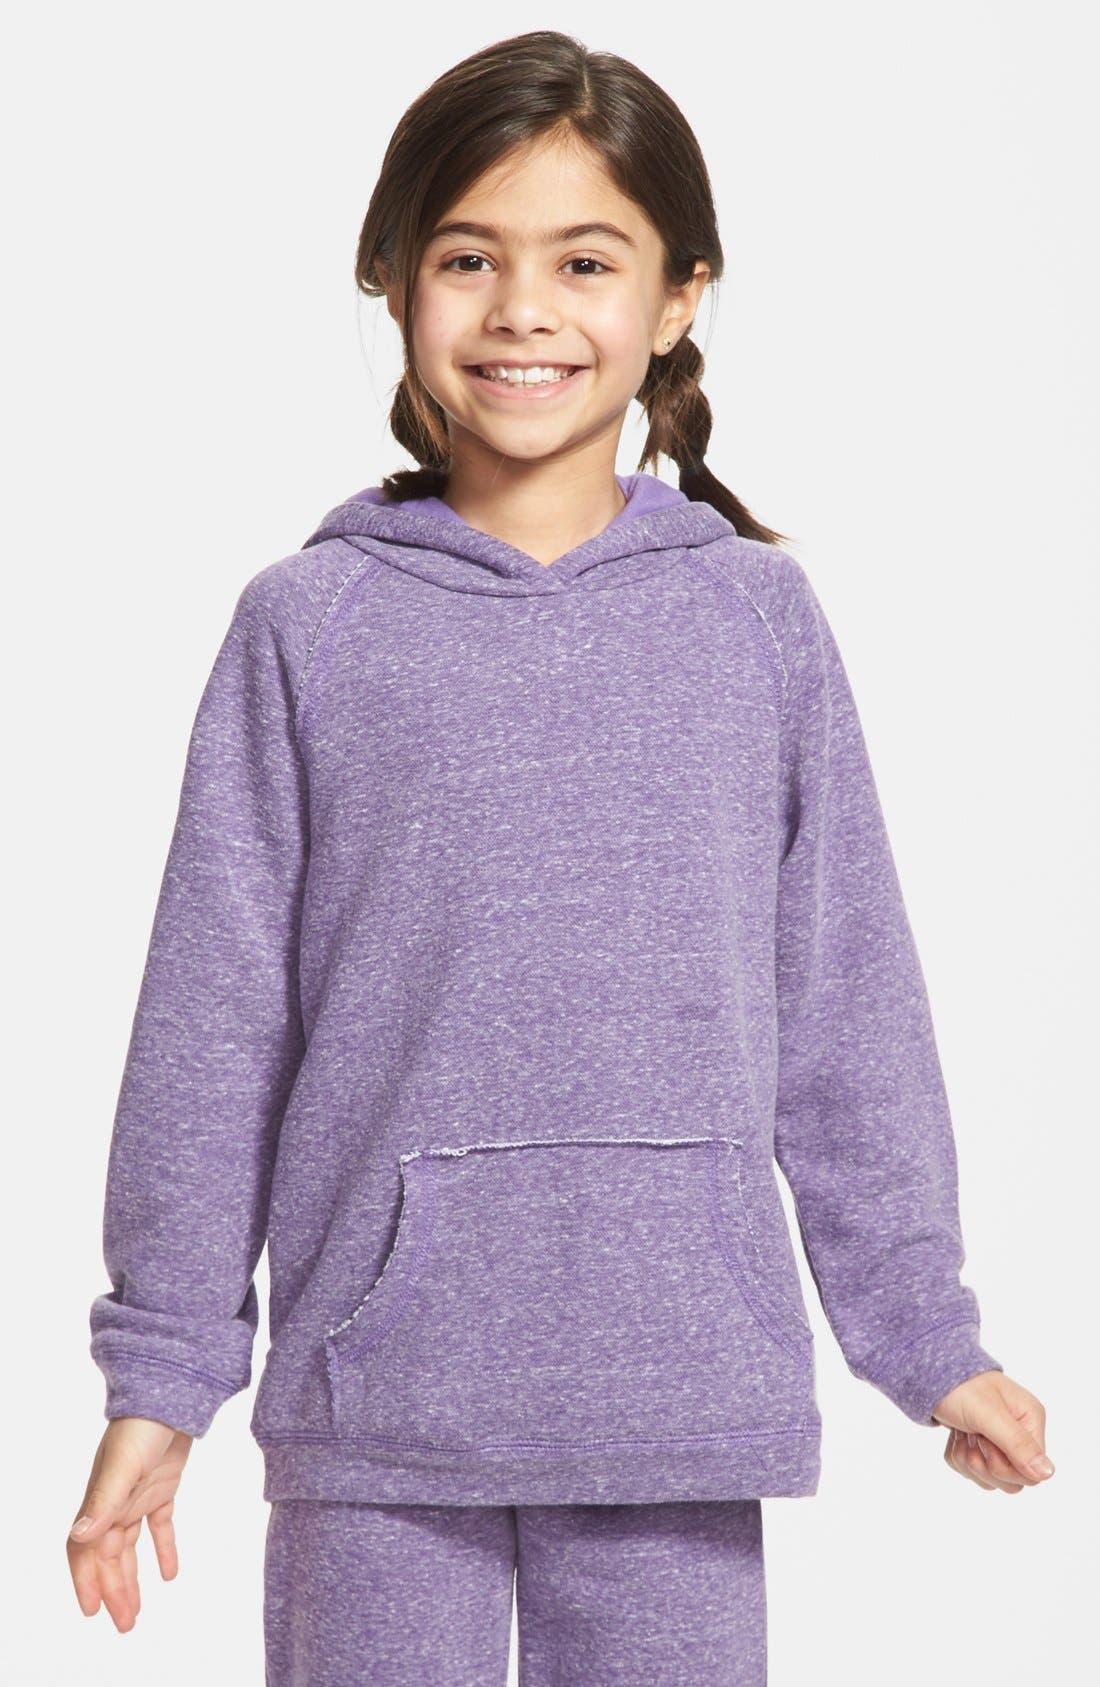 Alternate Image 1 Selected - Peek 'Logan' Pullover Fleece Hoodie (Toddler Girls, Little Girls & Big Girls)